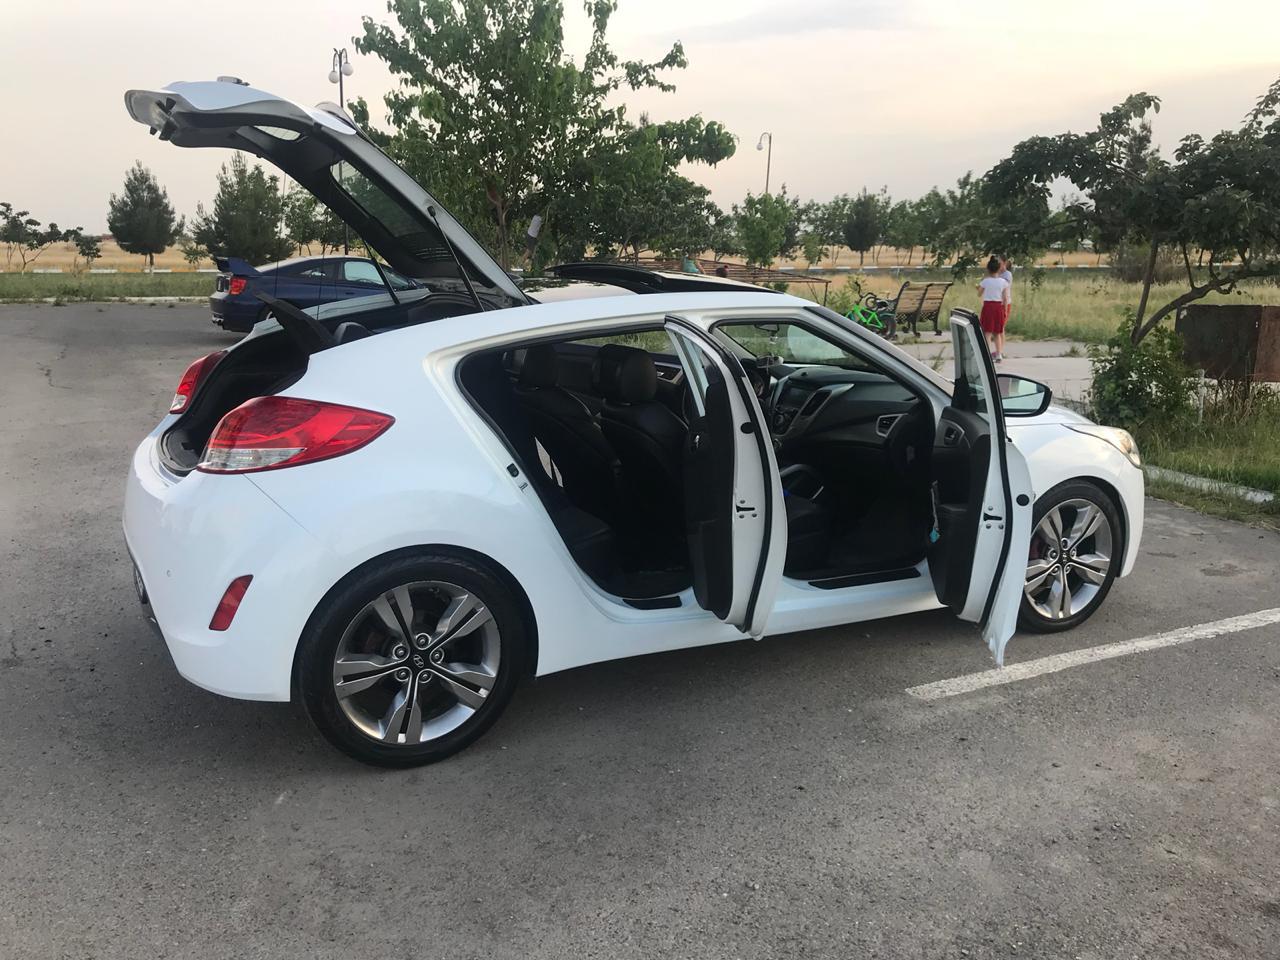 Hyundai Veloster 1.6(lt) 2012 İkinci əl  $10550